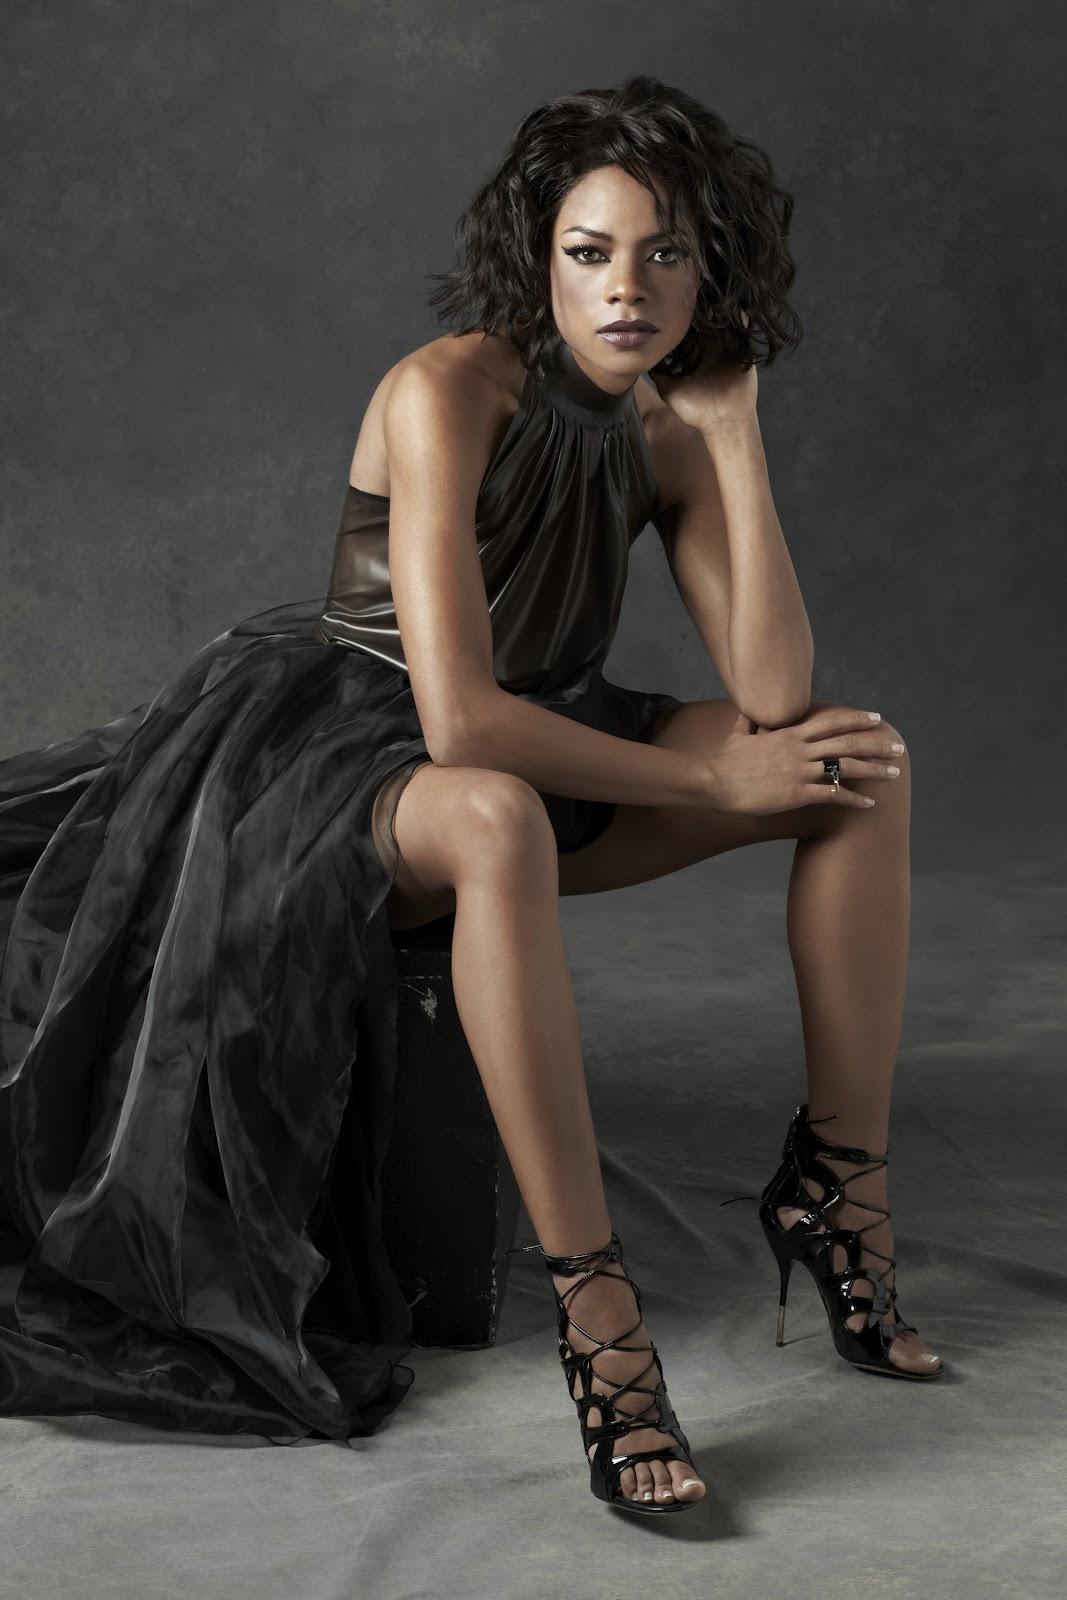 http://1.bp.blogspot.com/-nfv95oTt3Ag/T4paB0dDXkI/AAAAAAAACVI/onF2hF0eqnY/s1600/SF+-+Naomie+Harris.jpg